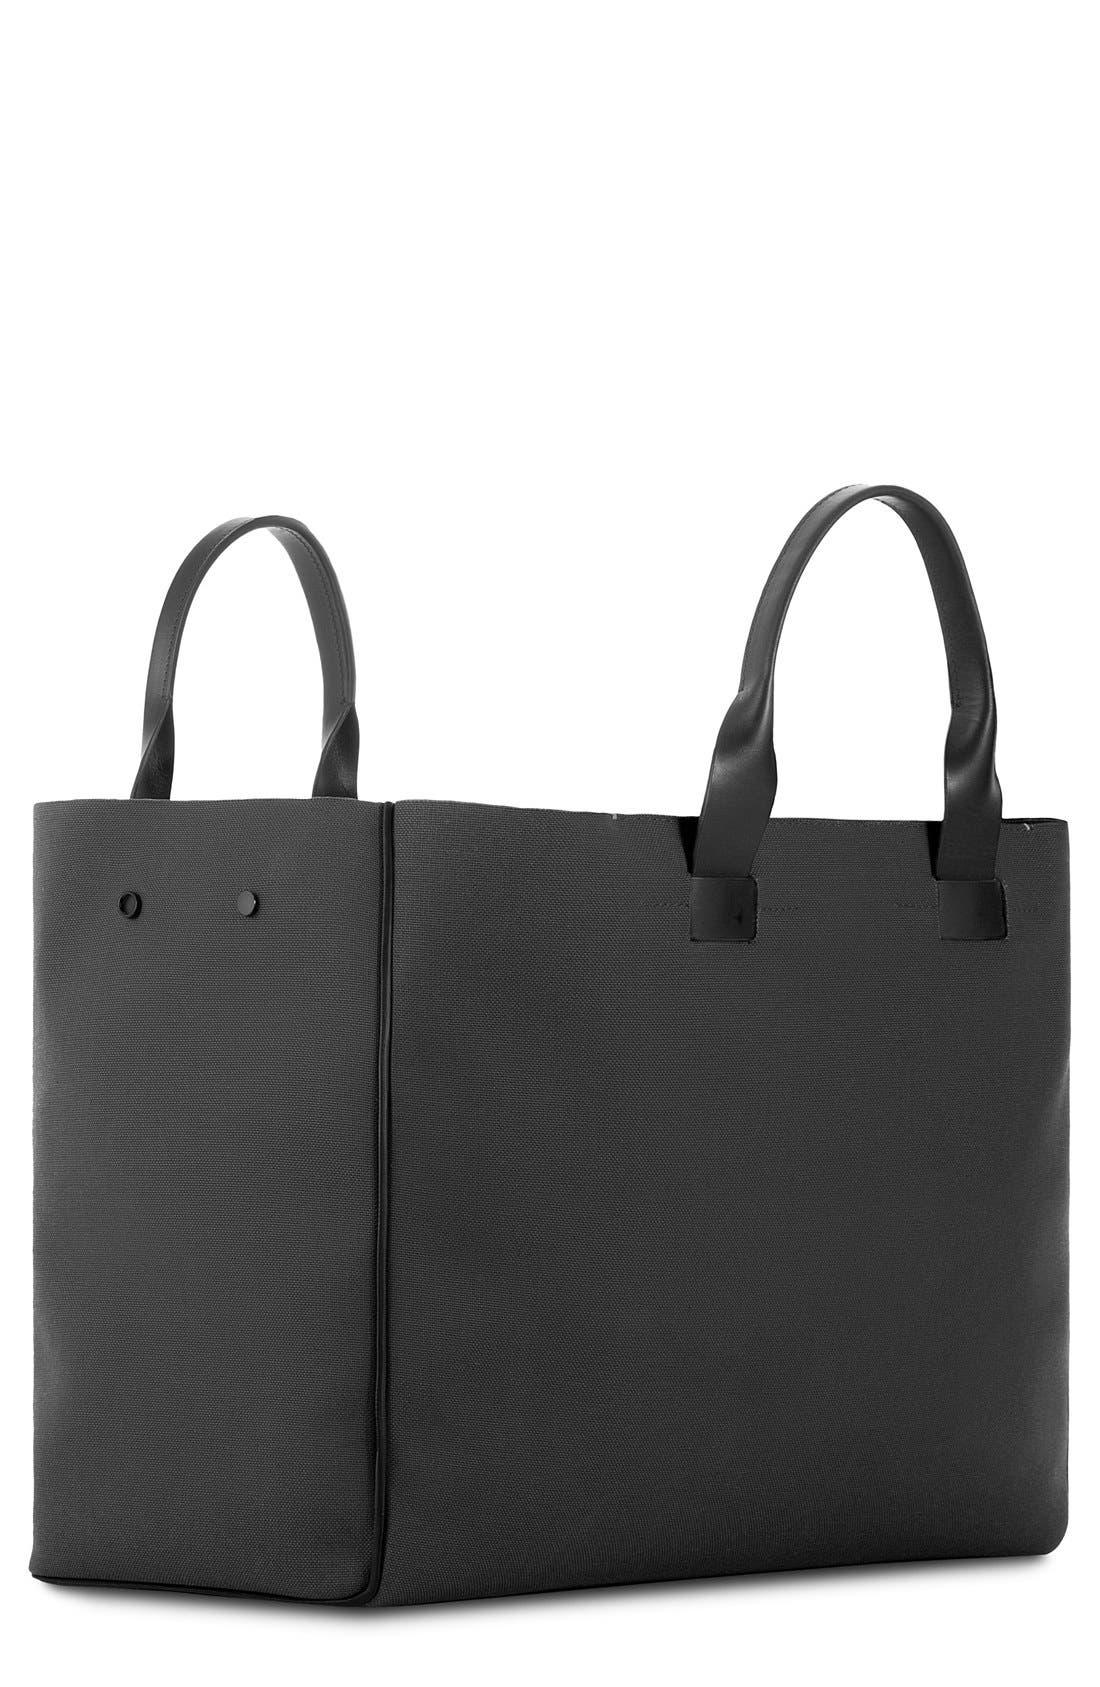 Nylon & Leather Tote Bag, Main, color, 001